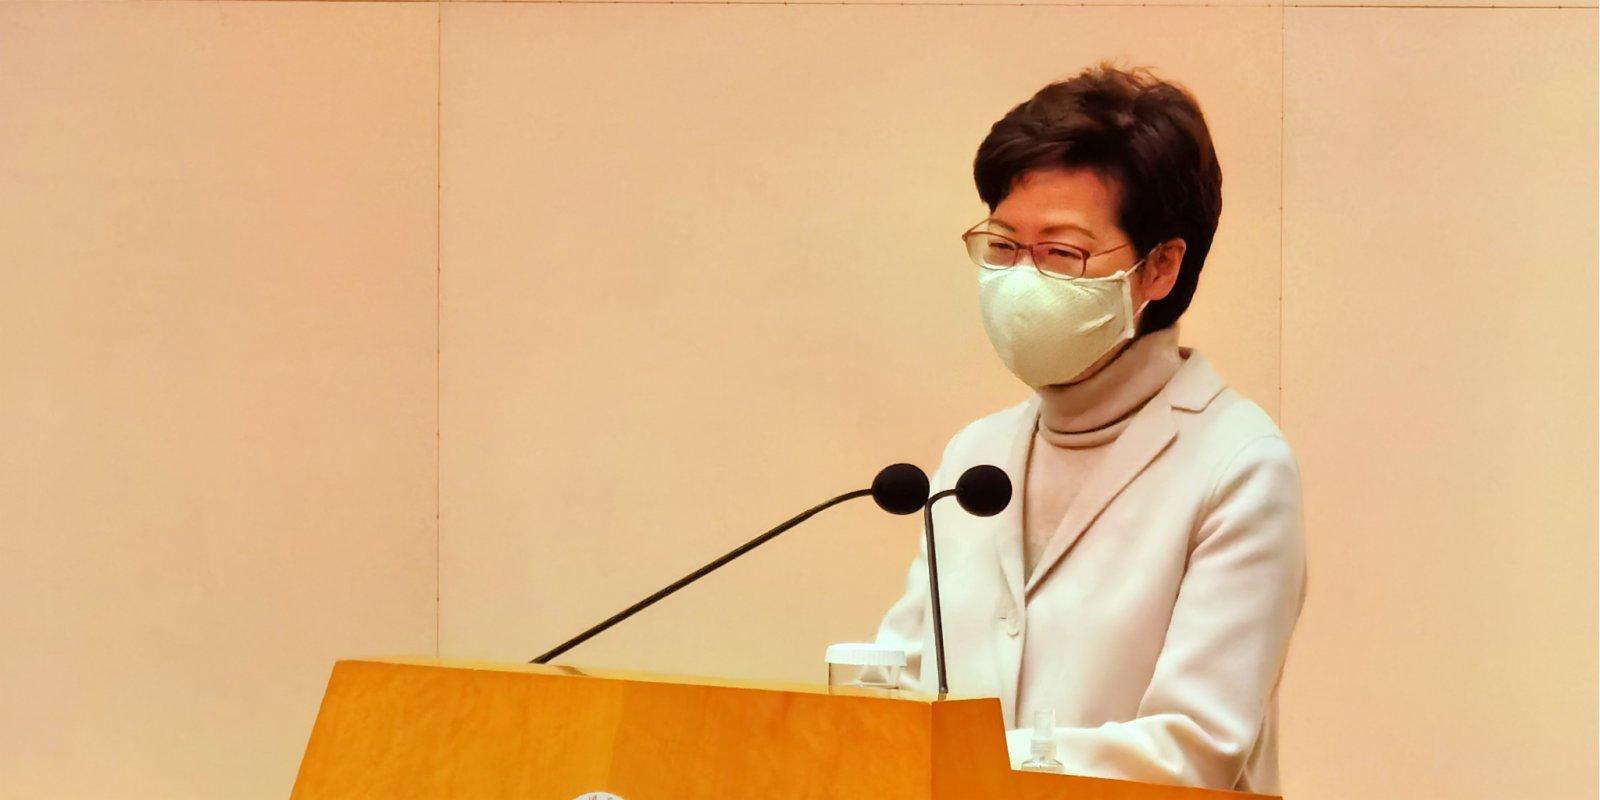 Hong Kong CE backs reform of electoral system